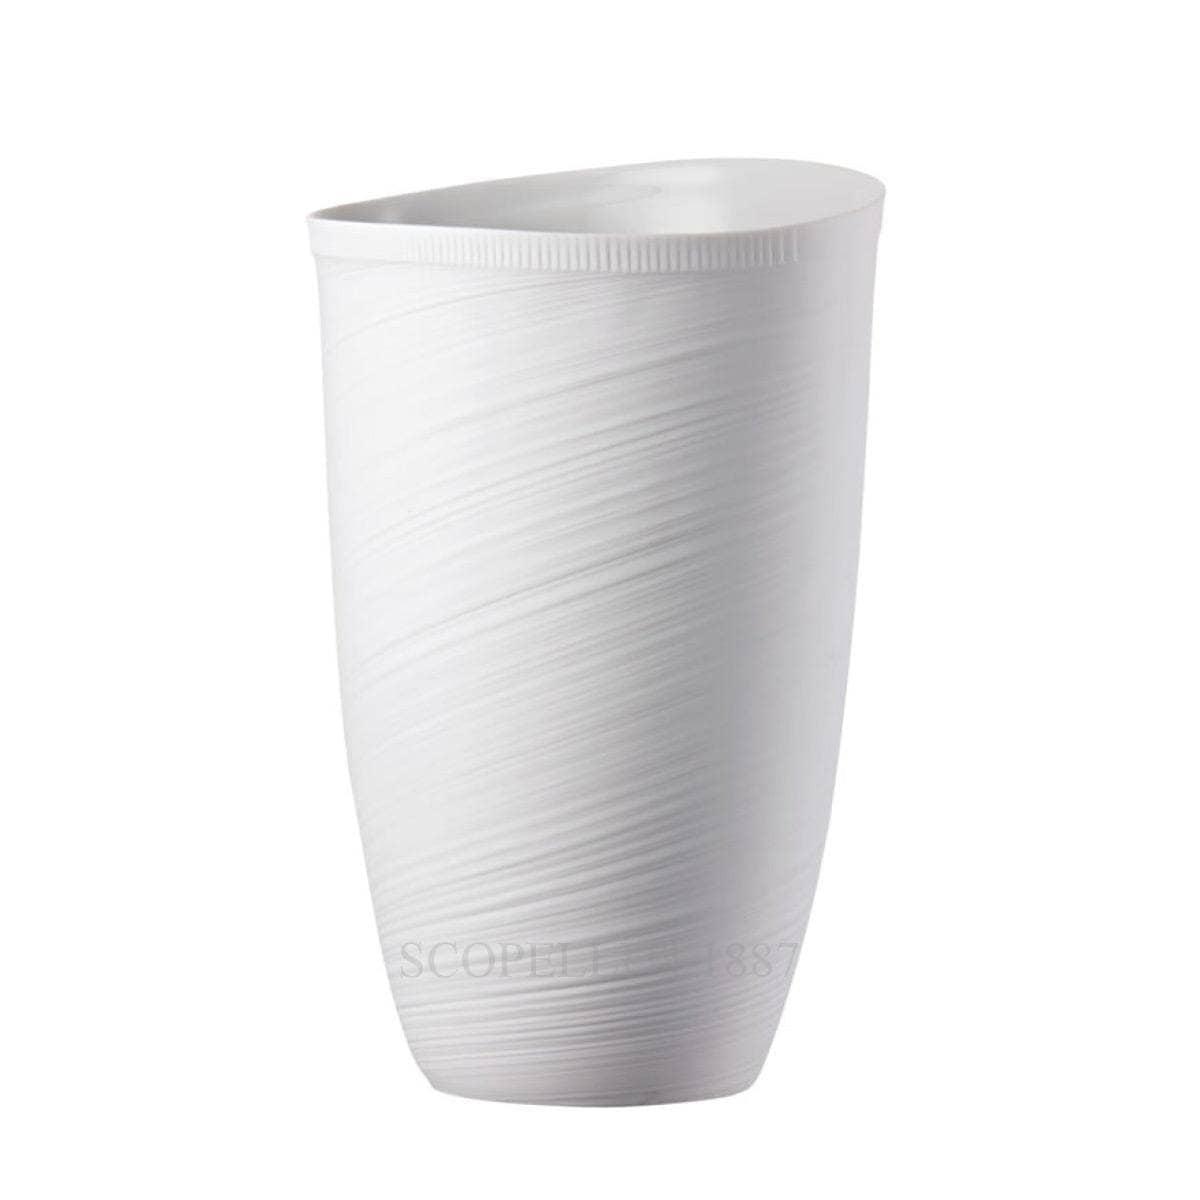 rosenthal studioline papyrus designer white vase